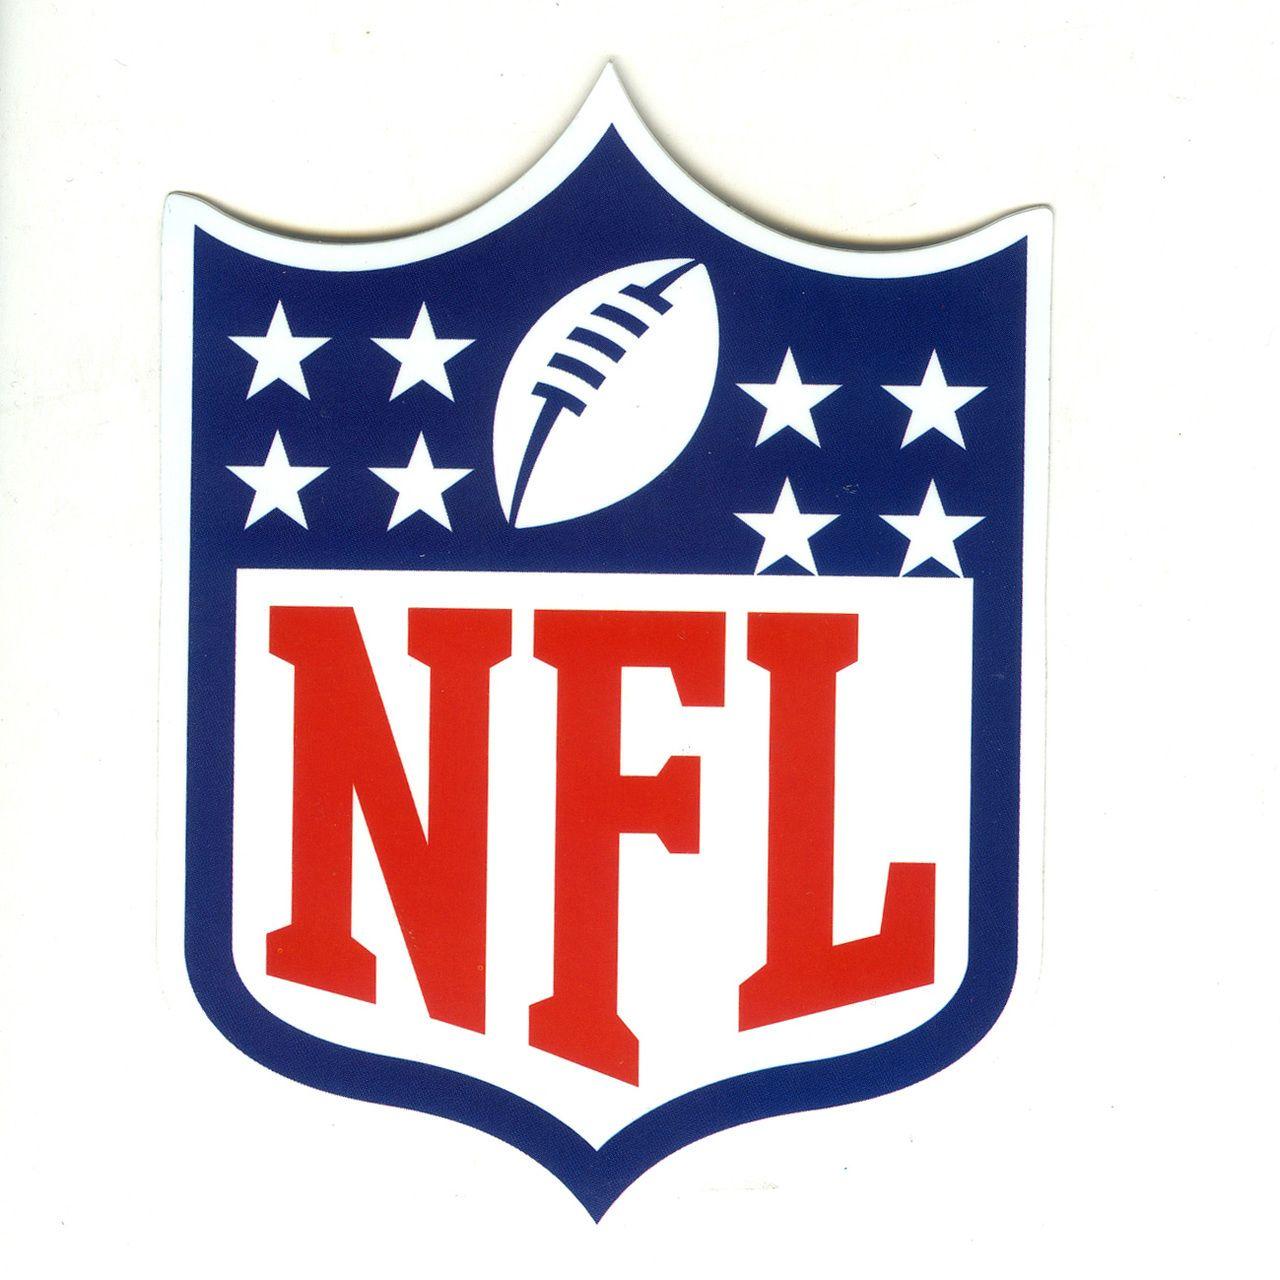 1467 Nfl Football Logo Heigth 10 Cm Decal Sticker Decalstar Com Nfl Logo Football League National Football League